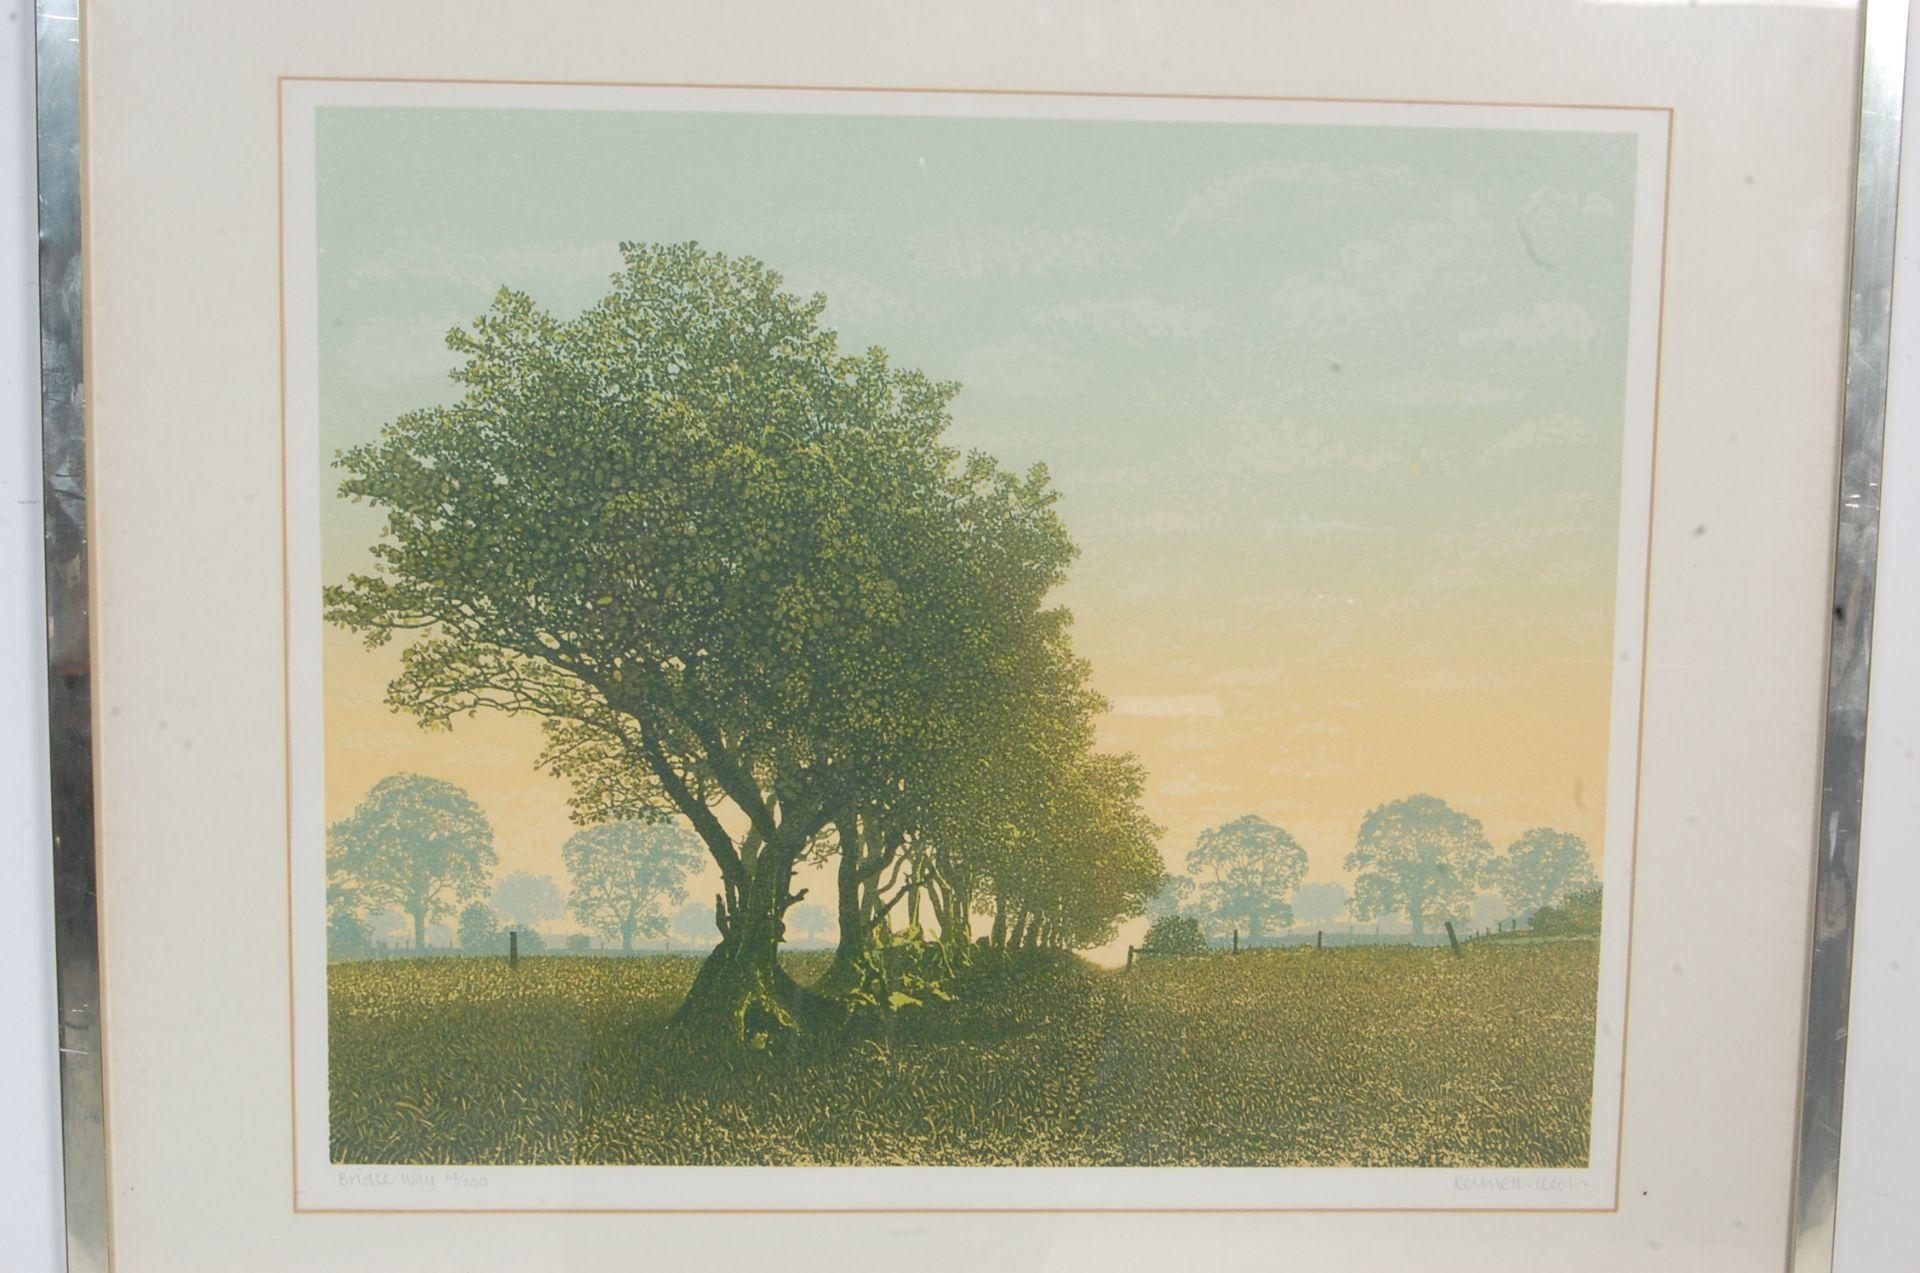 SIGNED LITHOGRAPH PLEINT BY KENNETH LEECH - BRIDLE WAY - Bild 2 aus 8